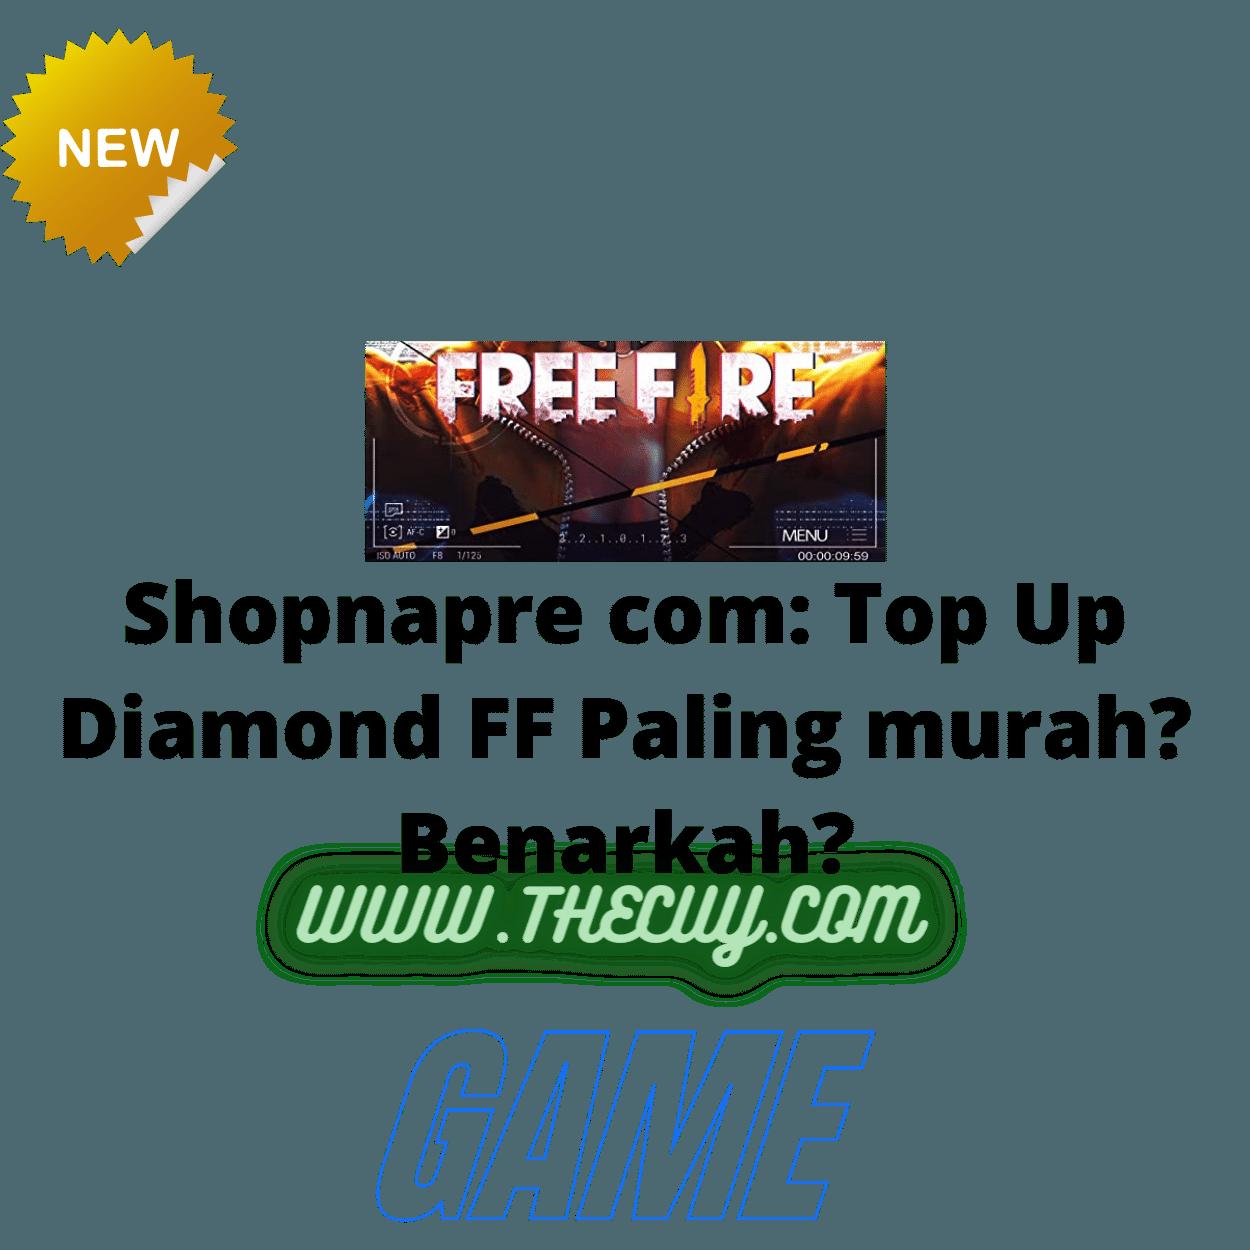 Shopnapre com: Top Up Diamond FF Paling murah? Benarkah?